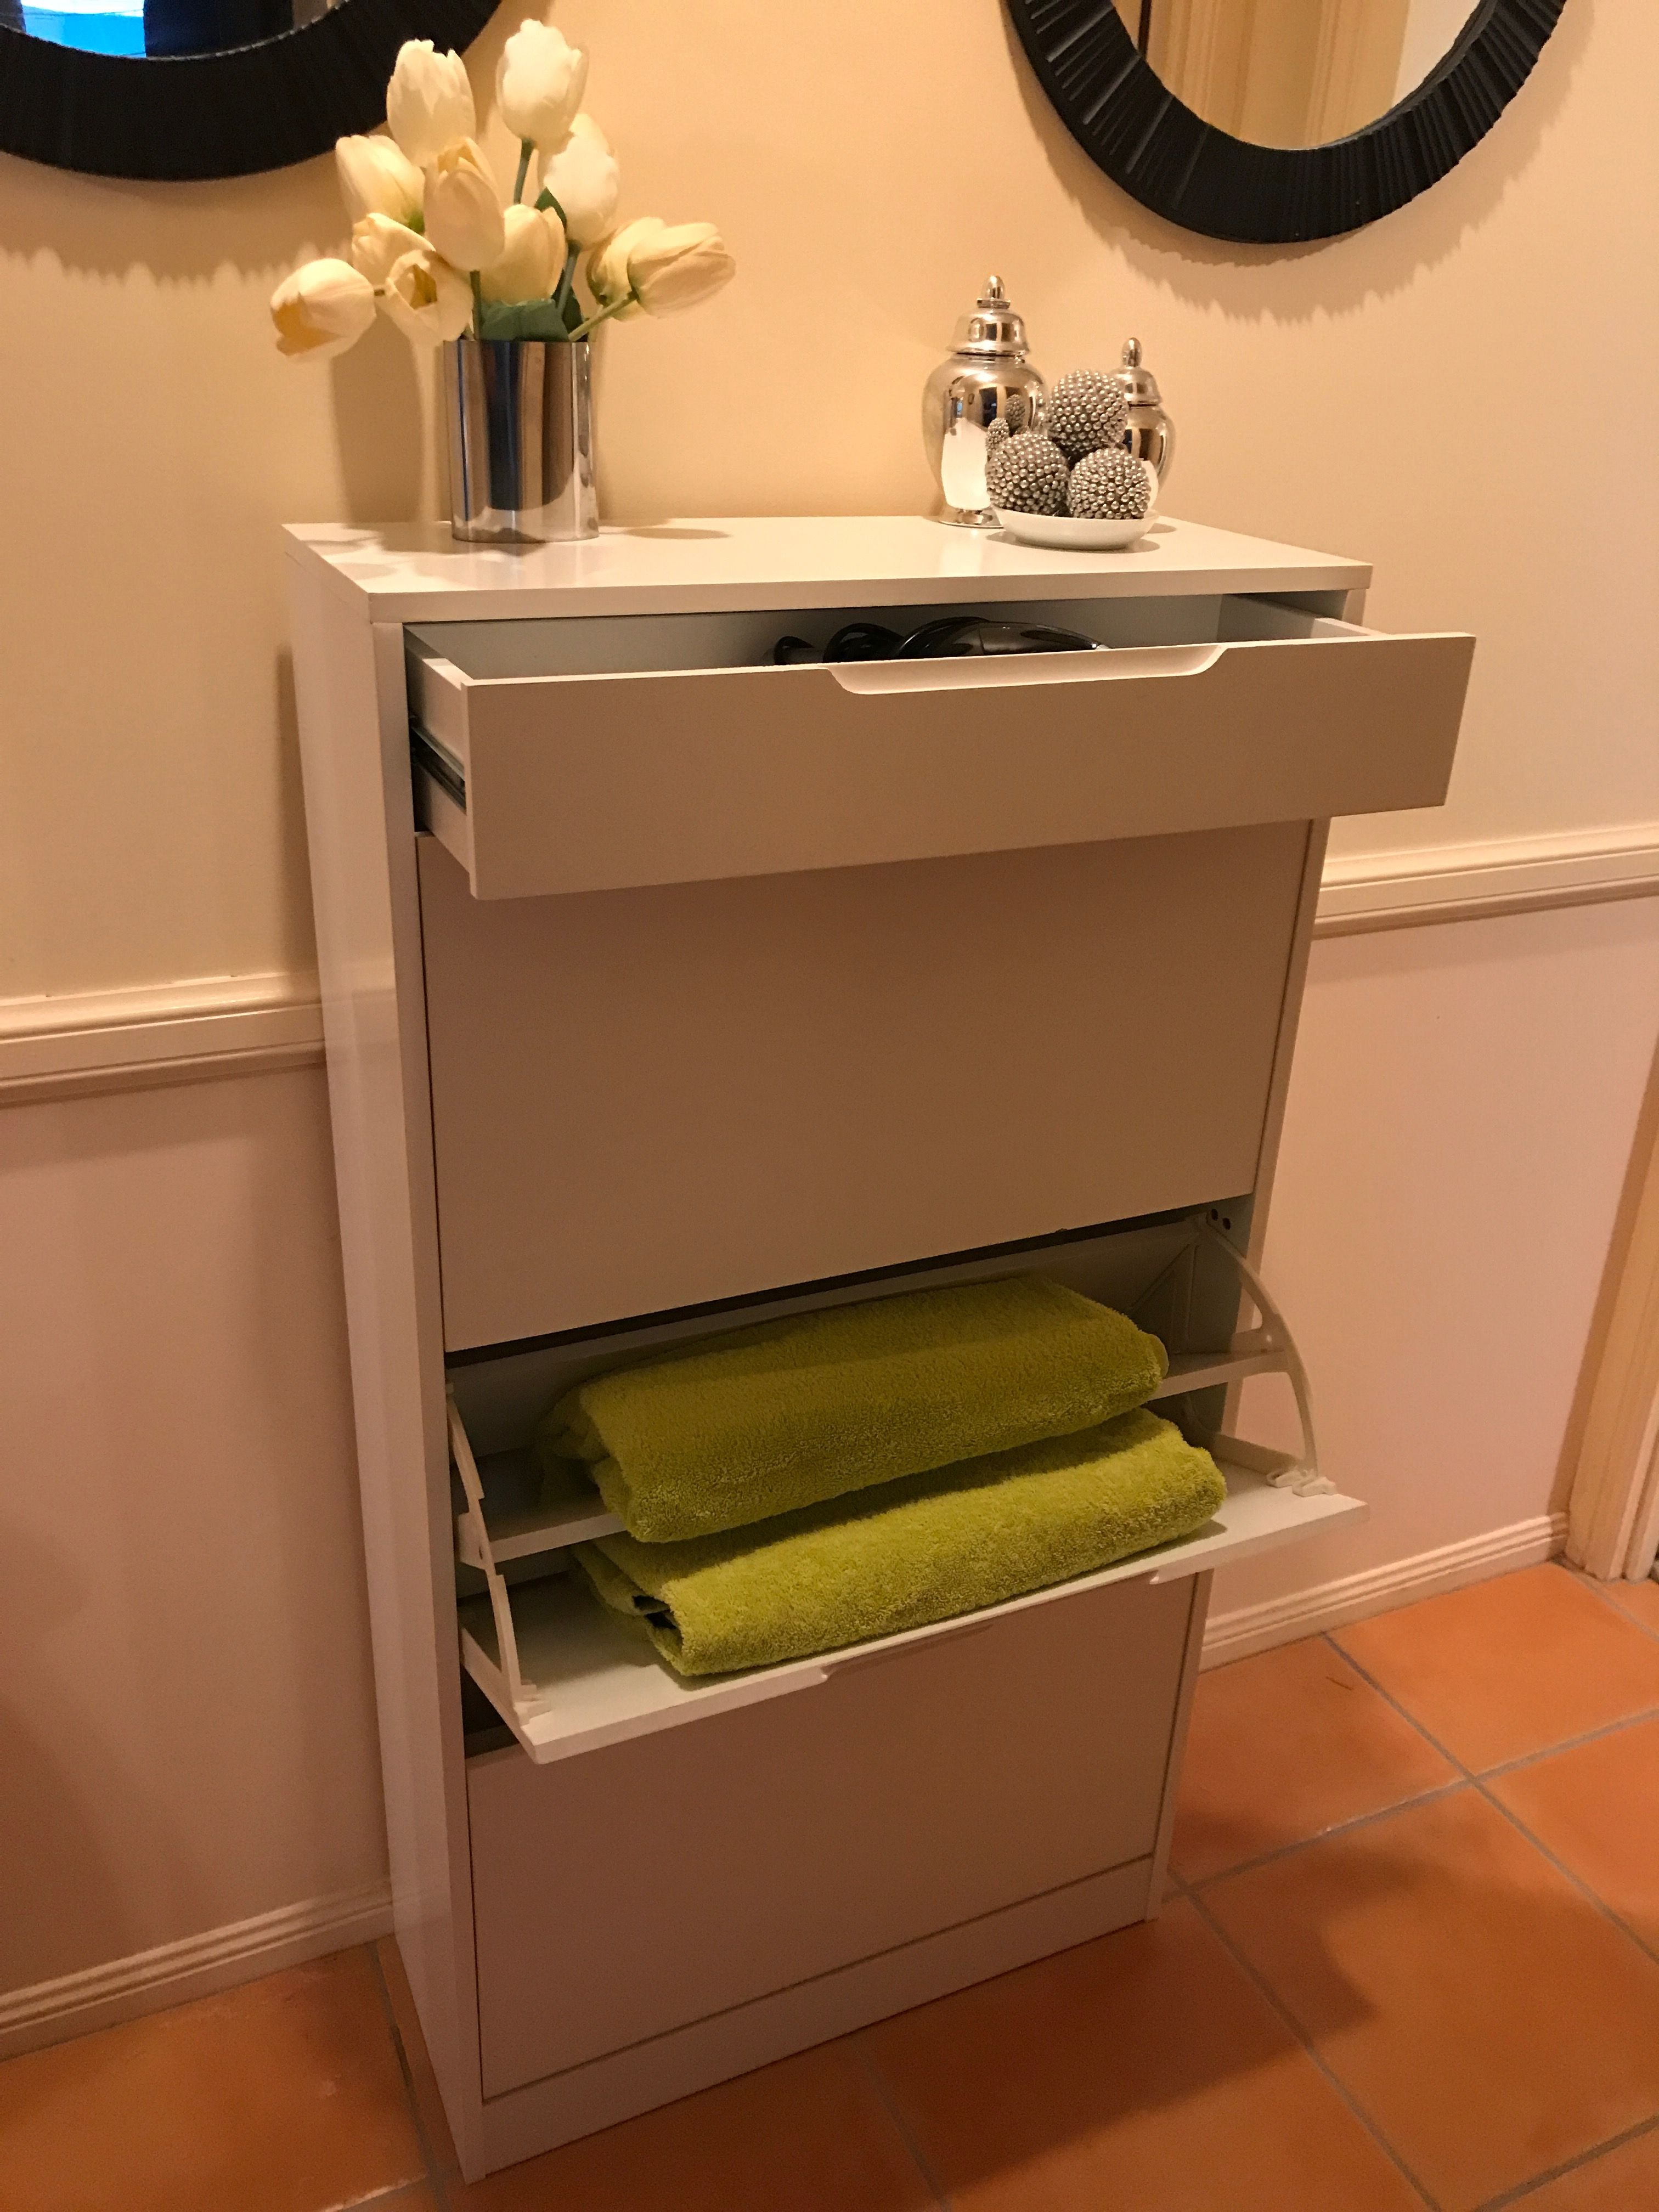 Ikea Aldi Shoe Cabinet Storage Organiser Perfect For